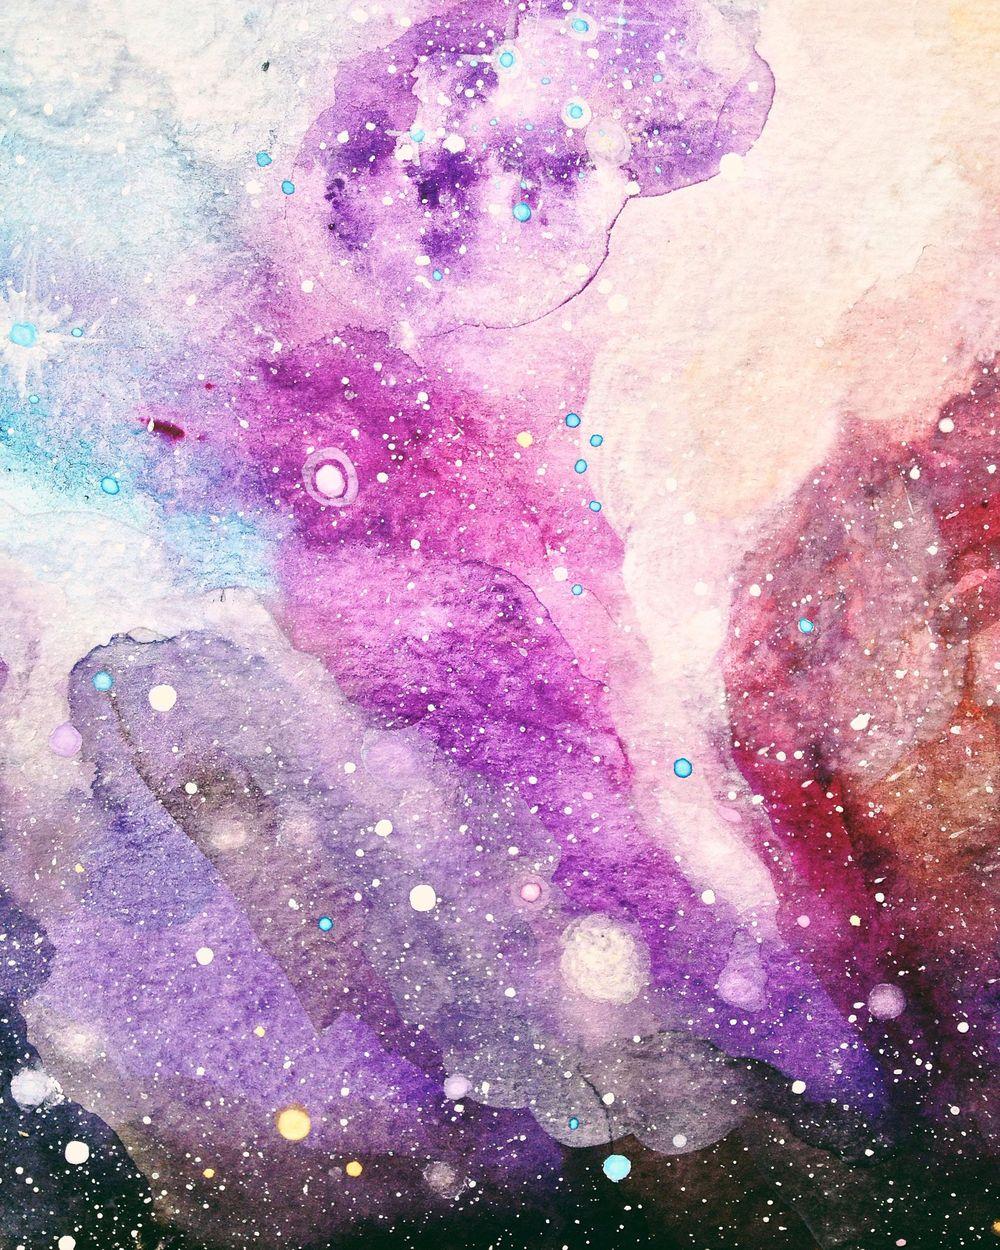 ☄ Watercolour Wonderland ☆ - image 8 - student project